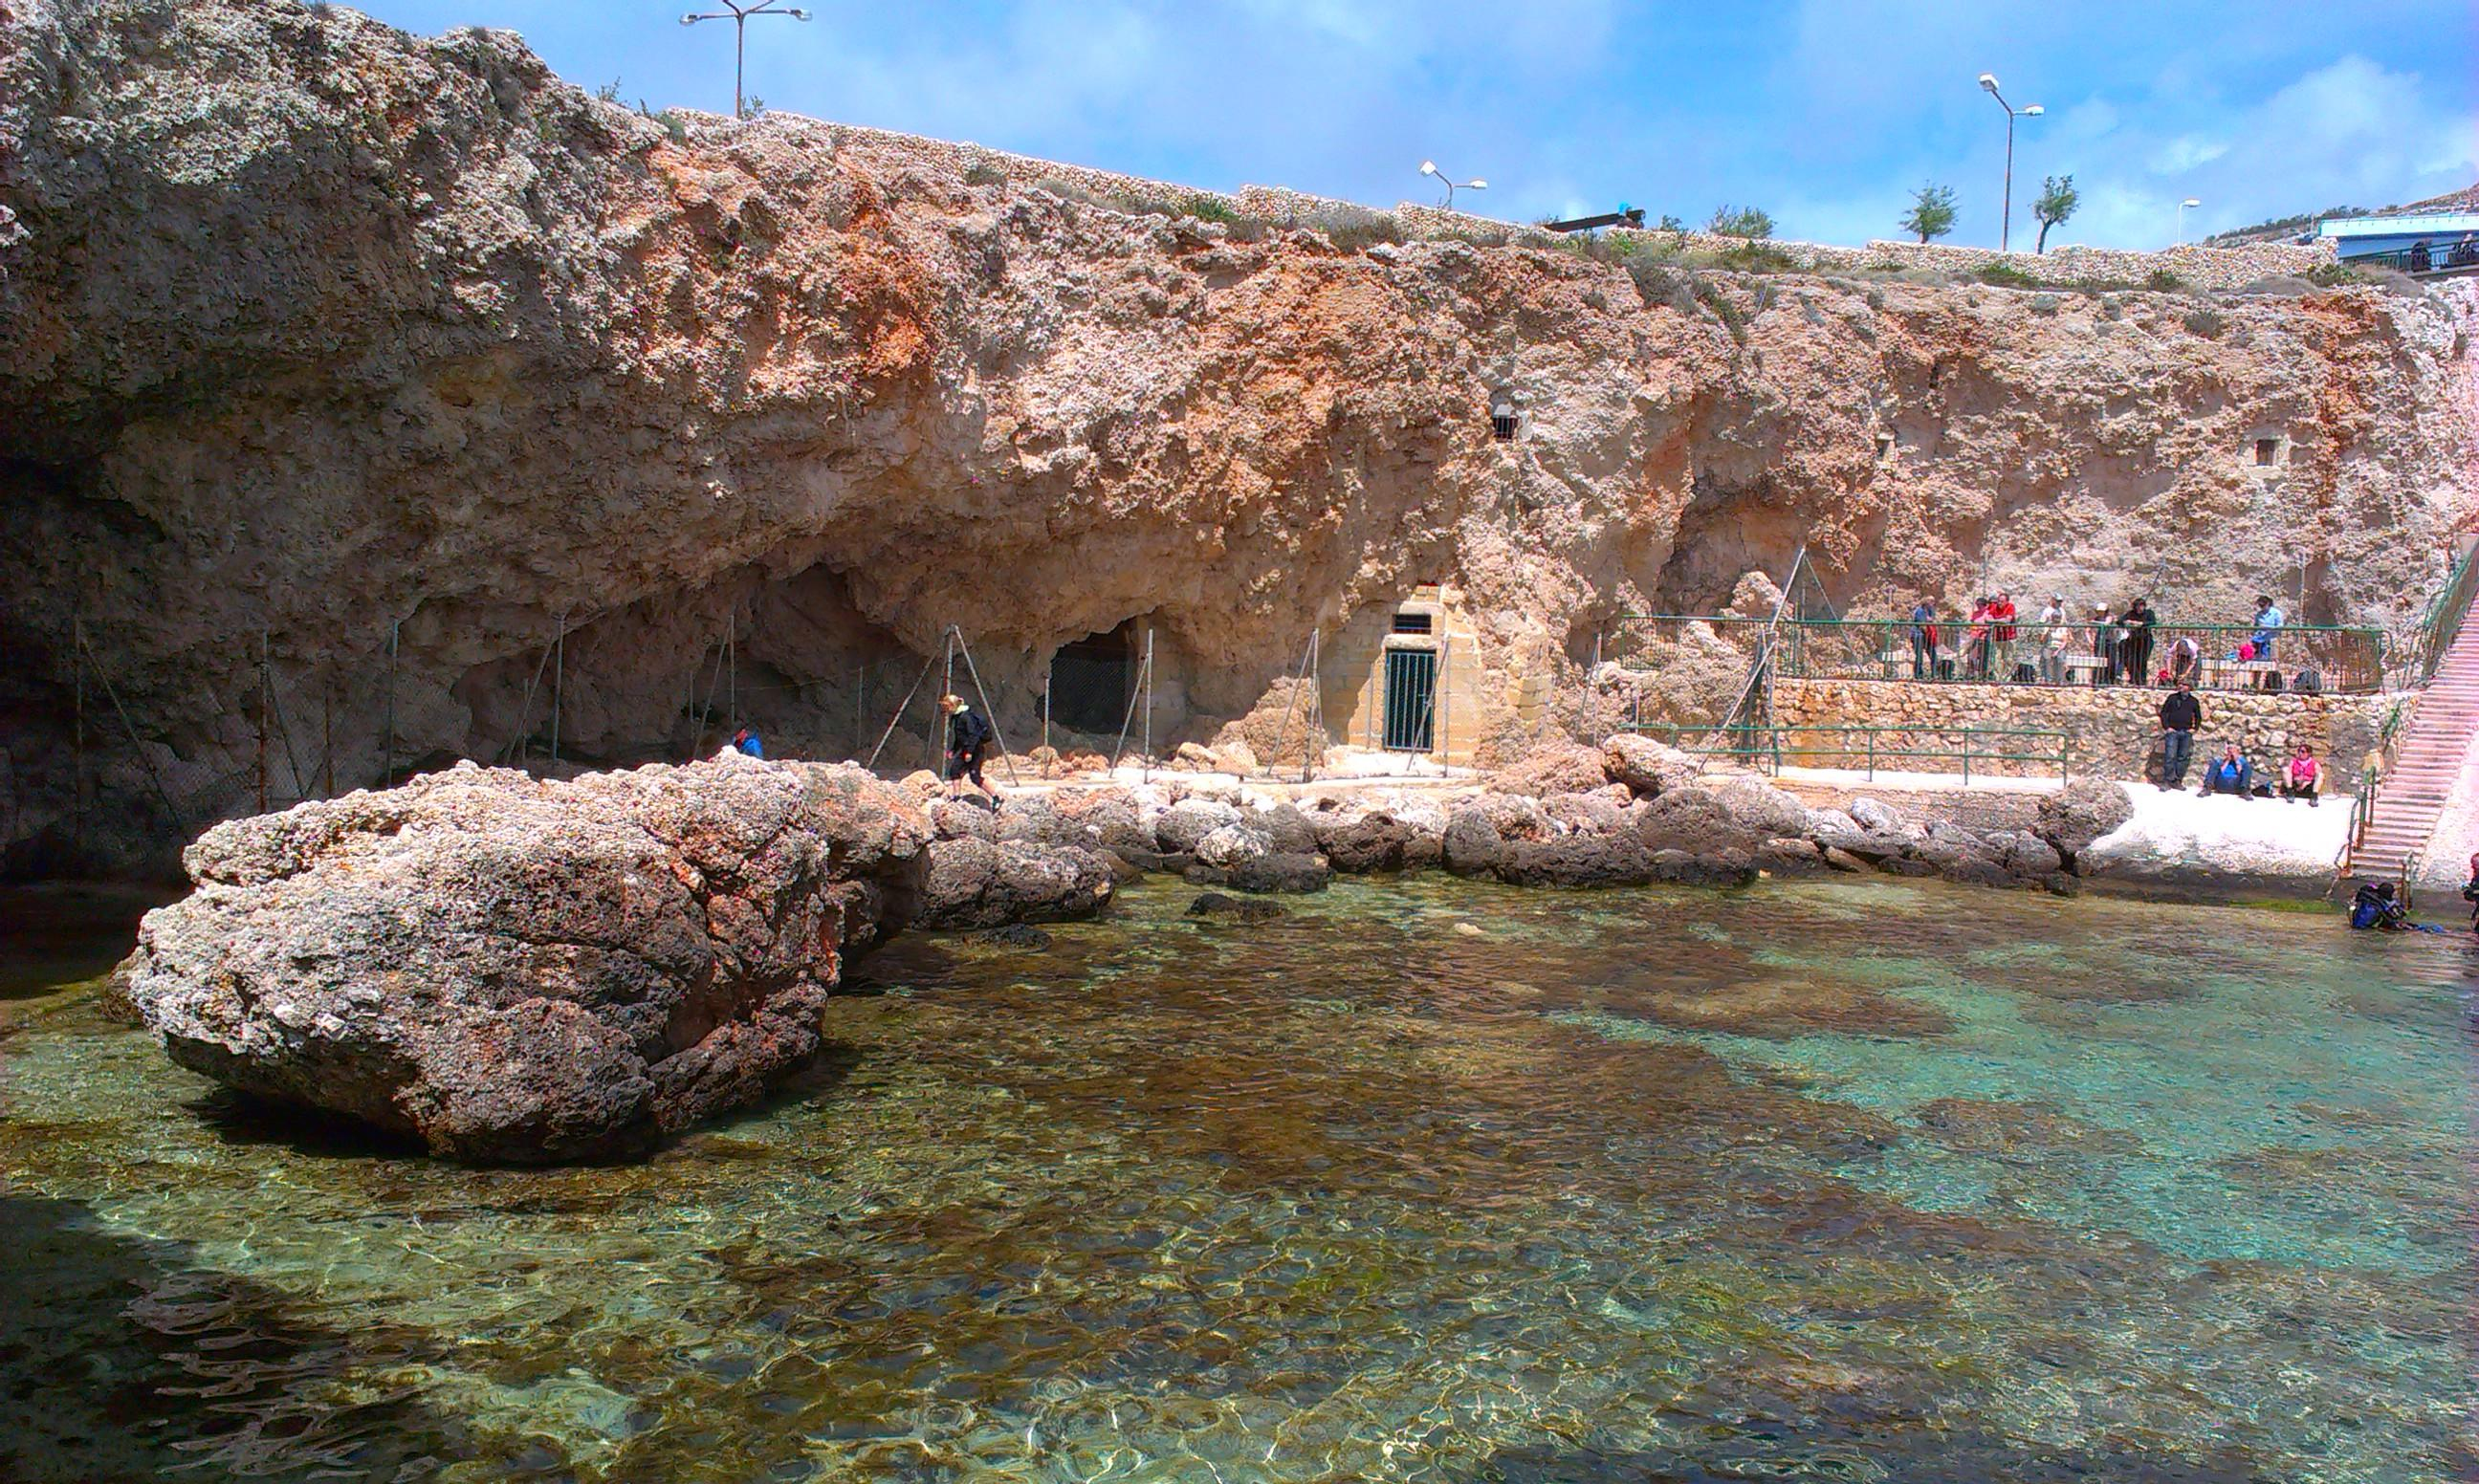 Ghar Lapsi cove